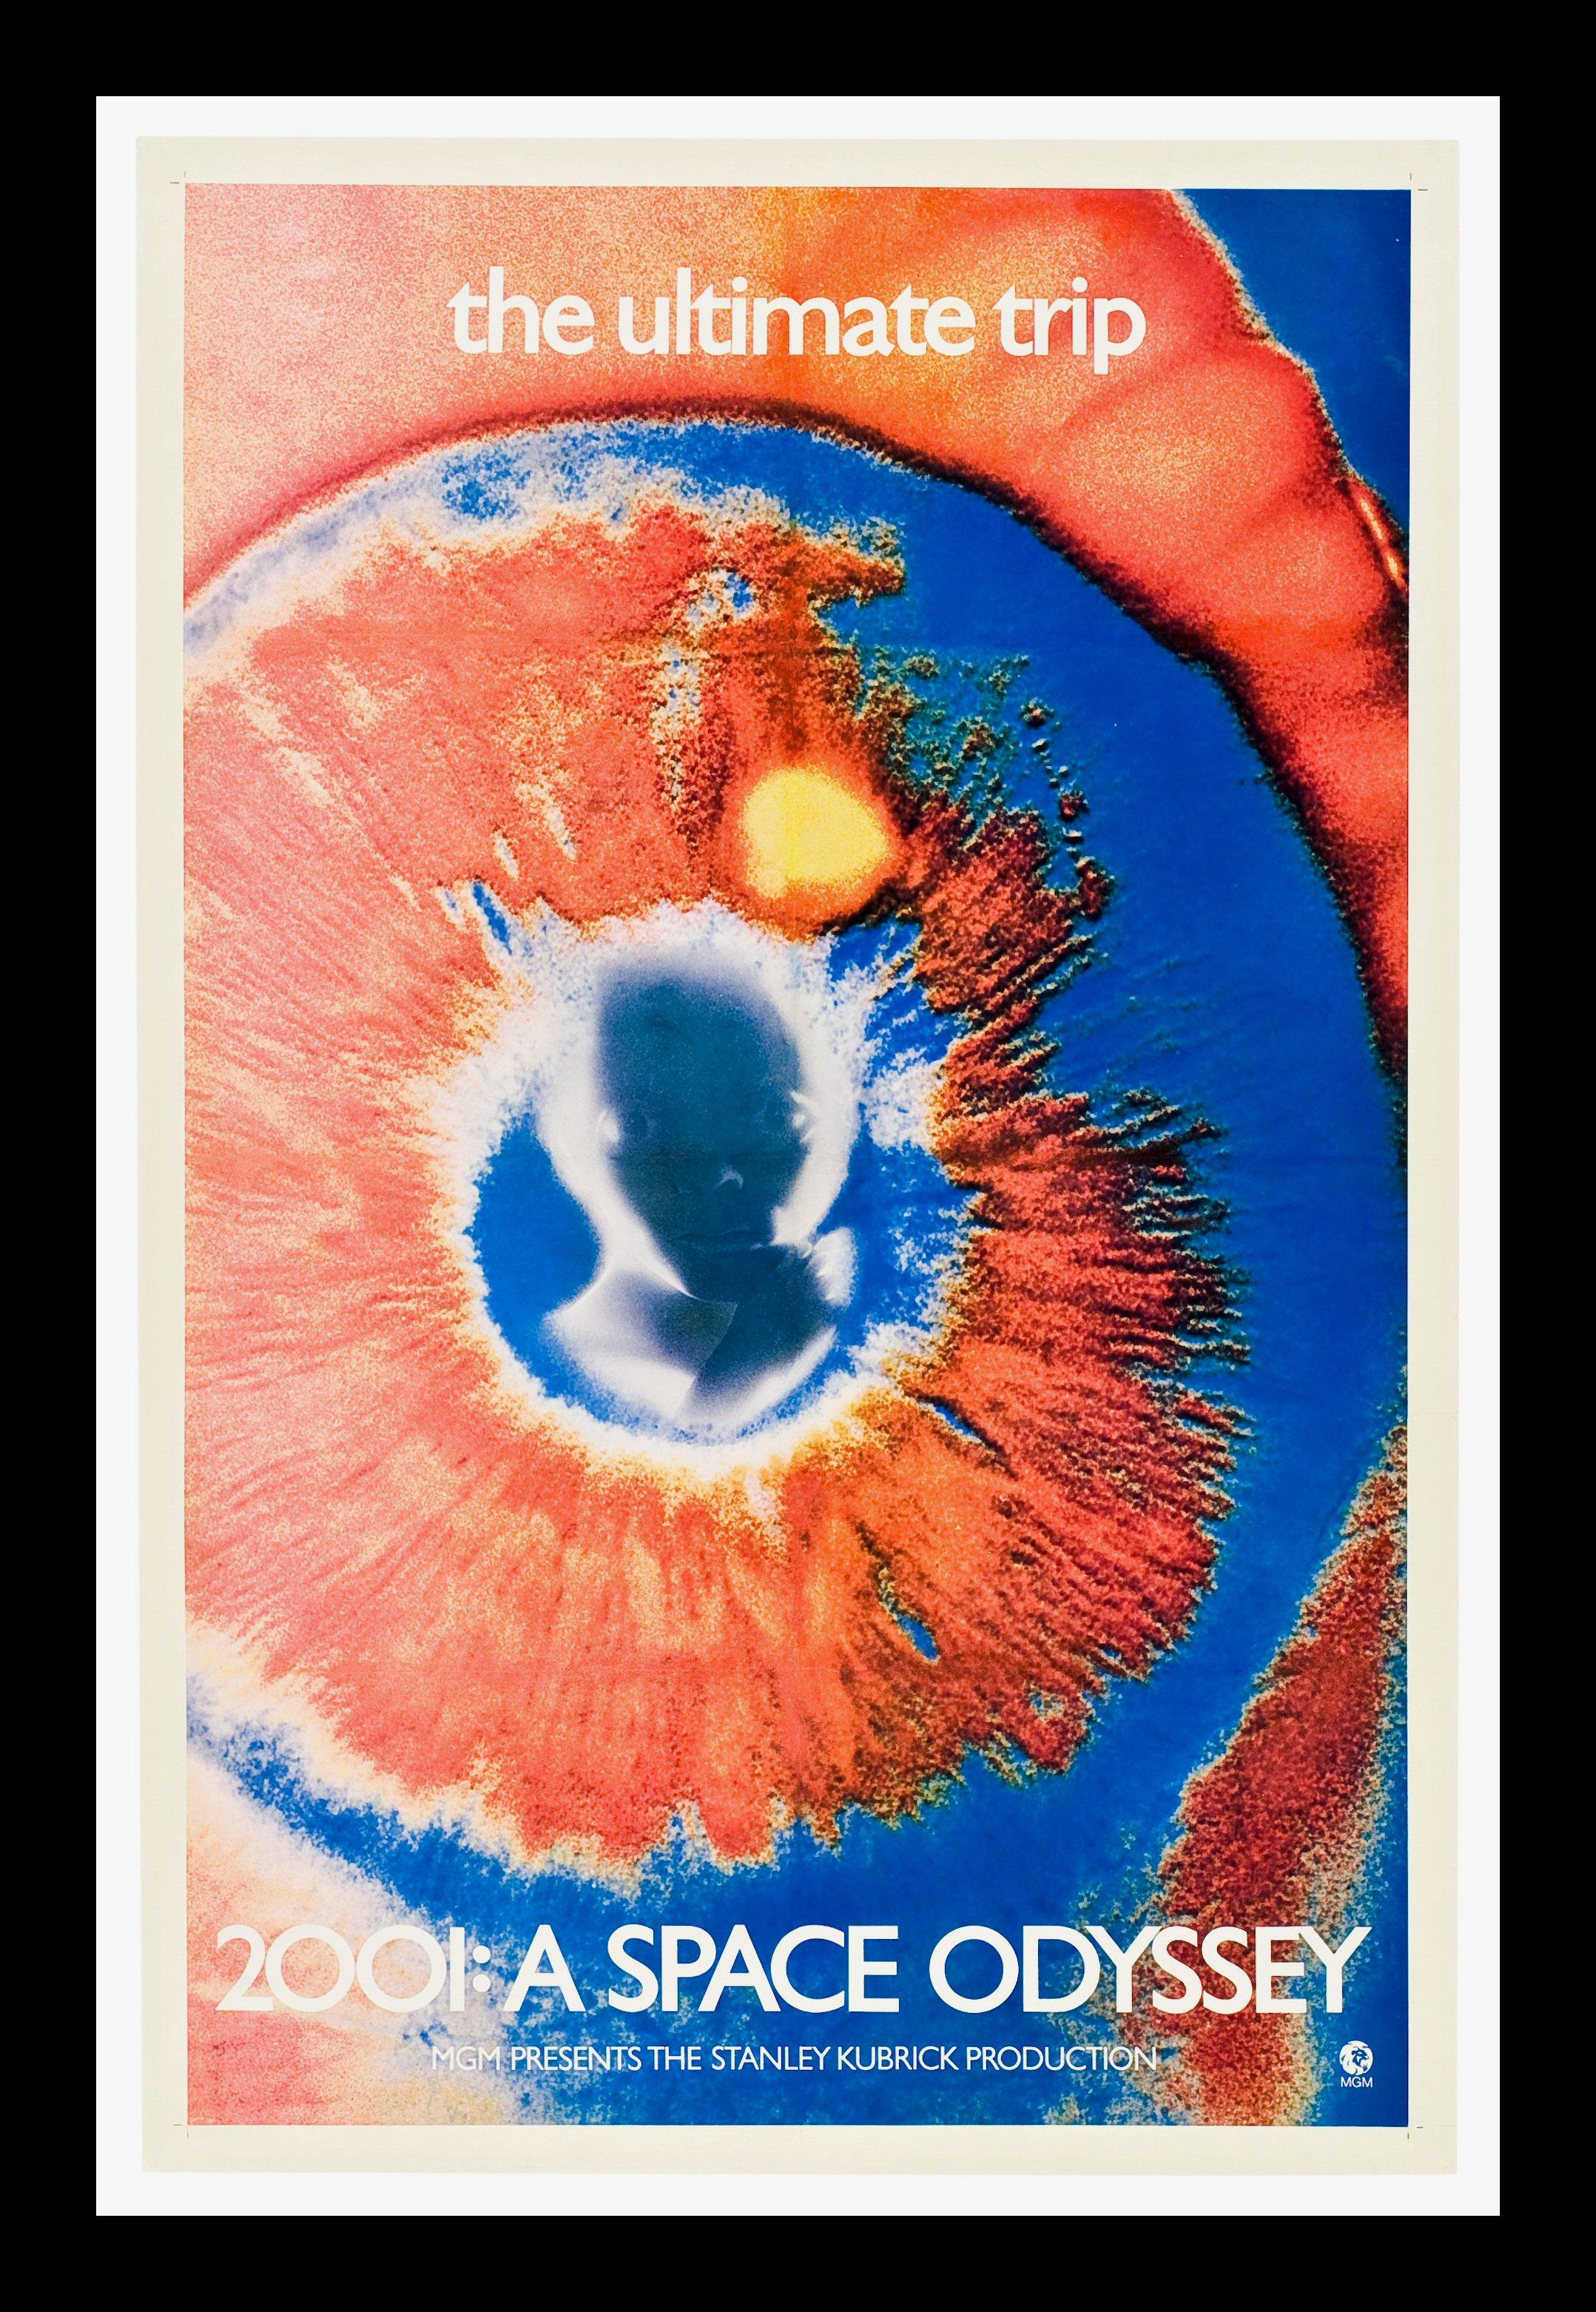 http://www.cinemasterpieces.com/aapics09/2001aug09.jpg